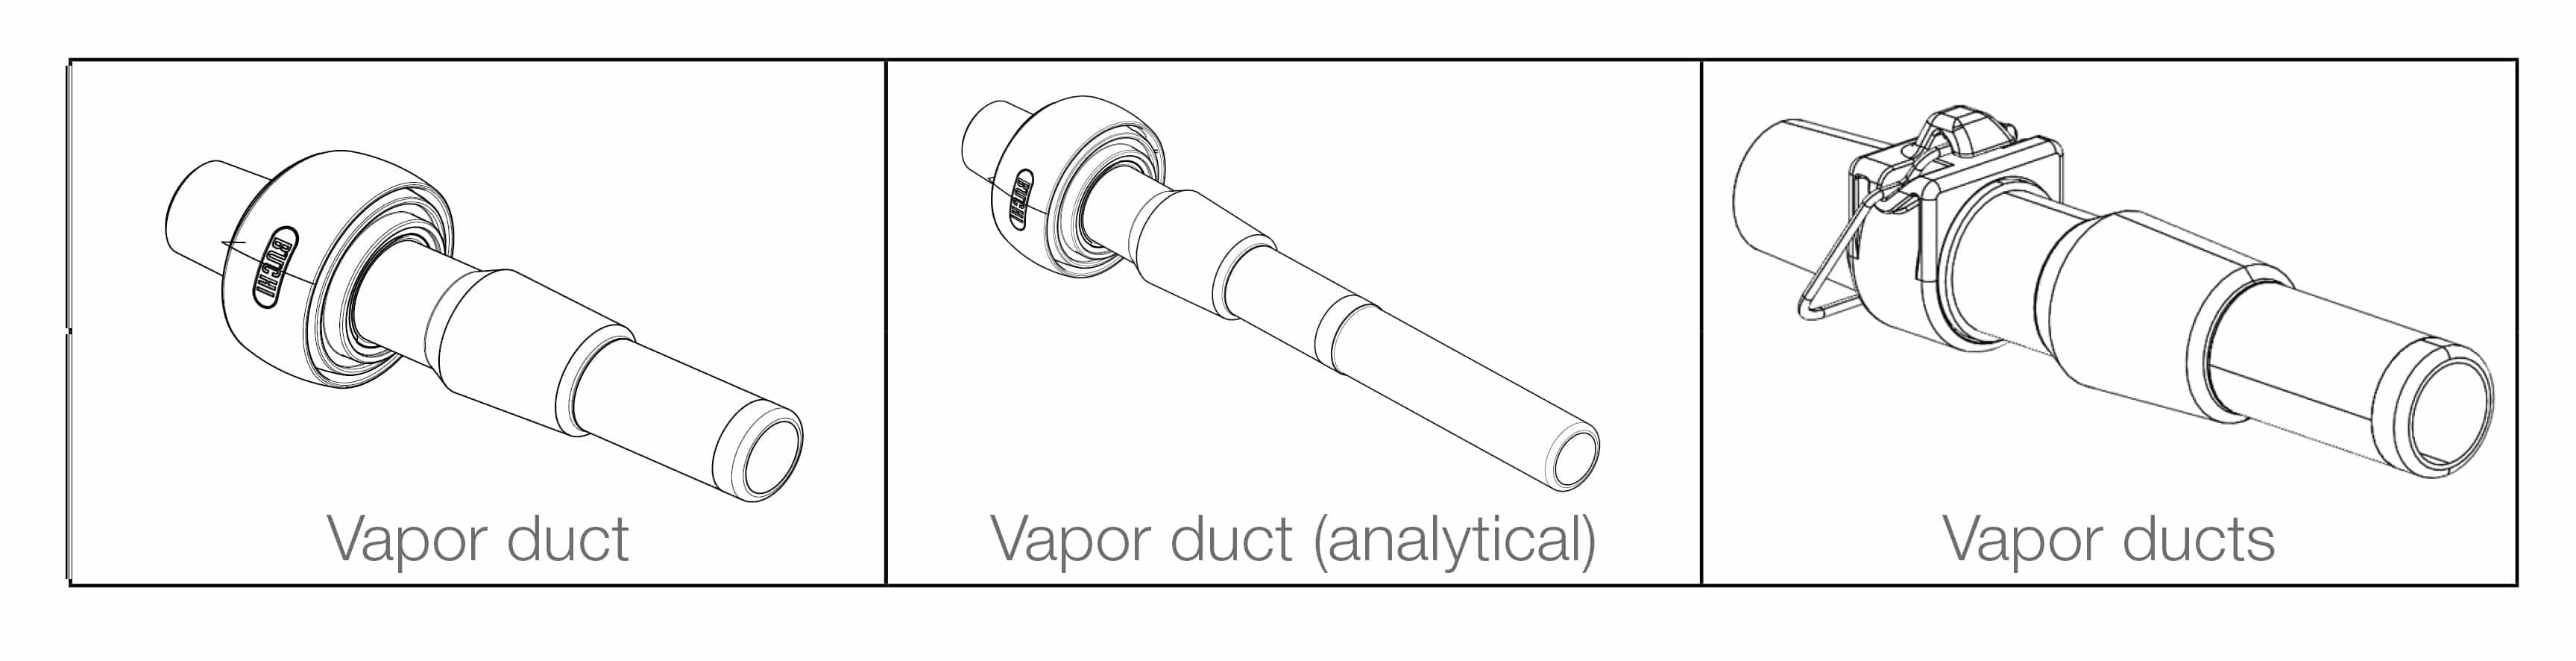 vapor duct, analytical vapor duct, rotary evaporation, laboratory evaporation